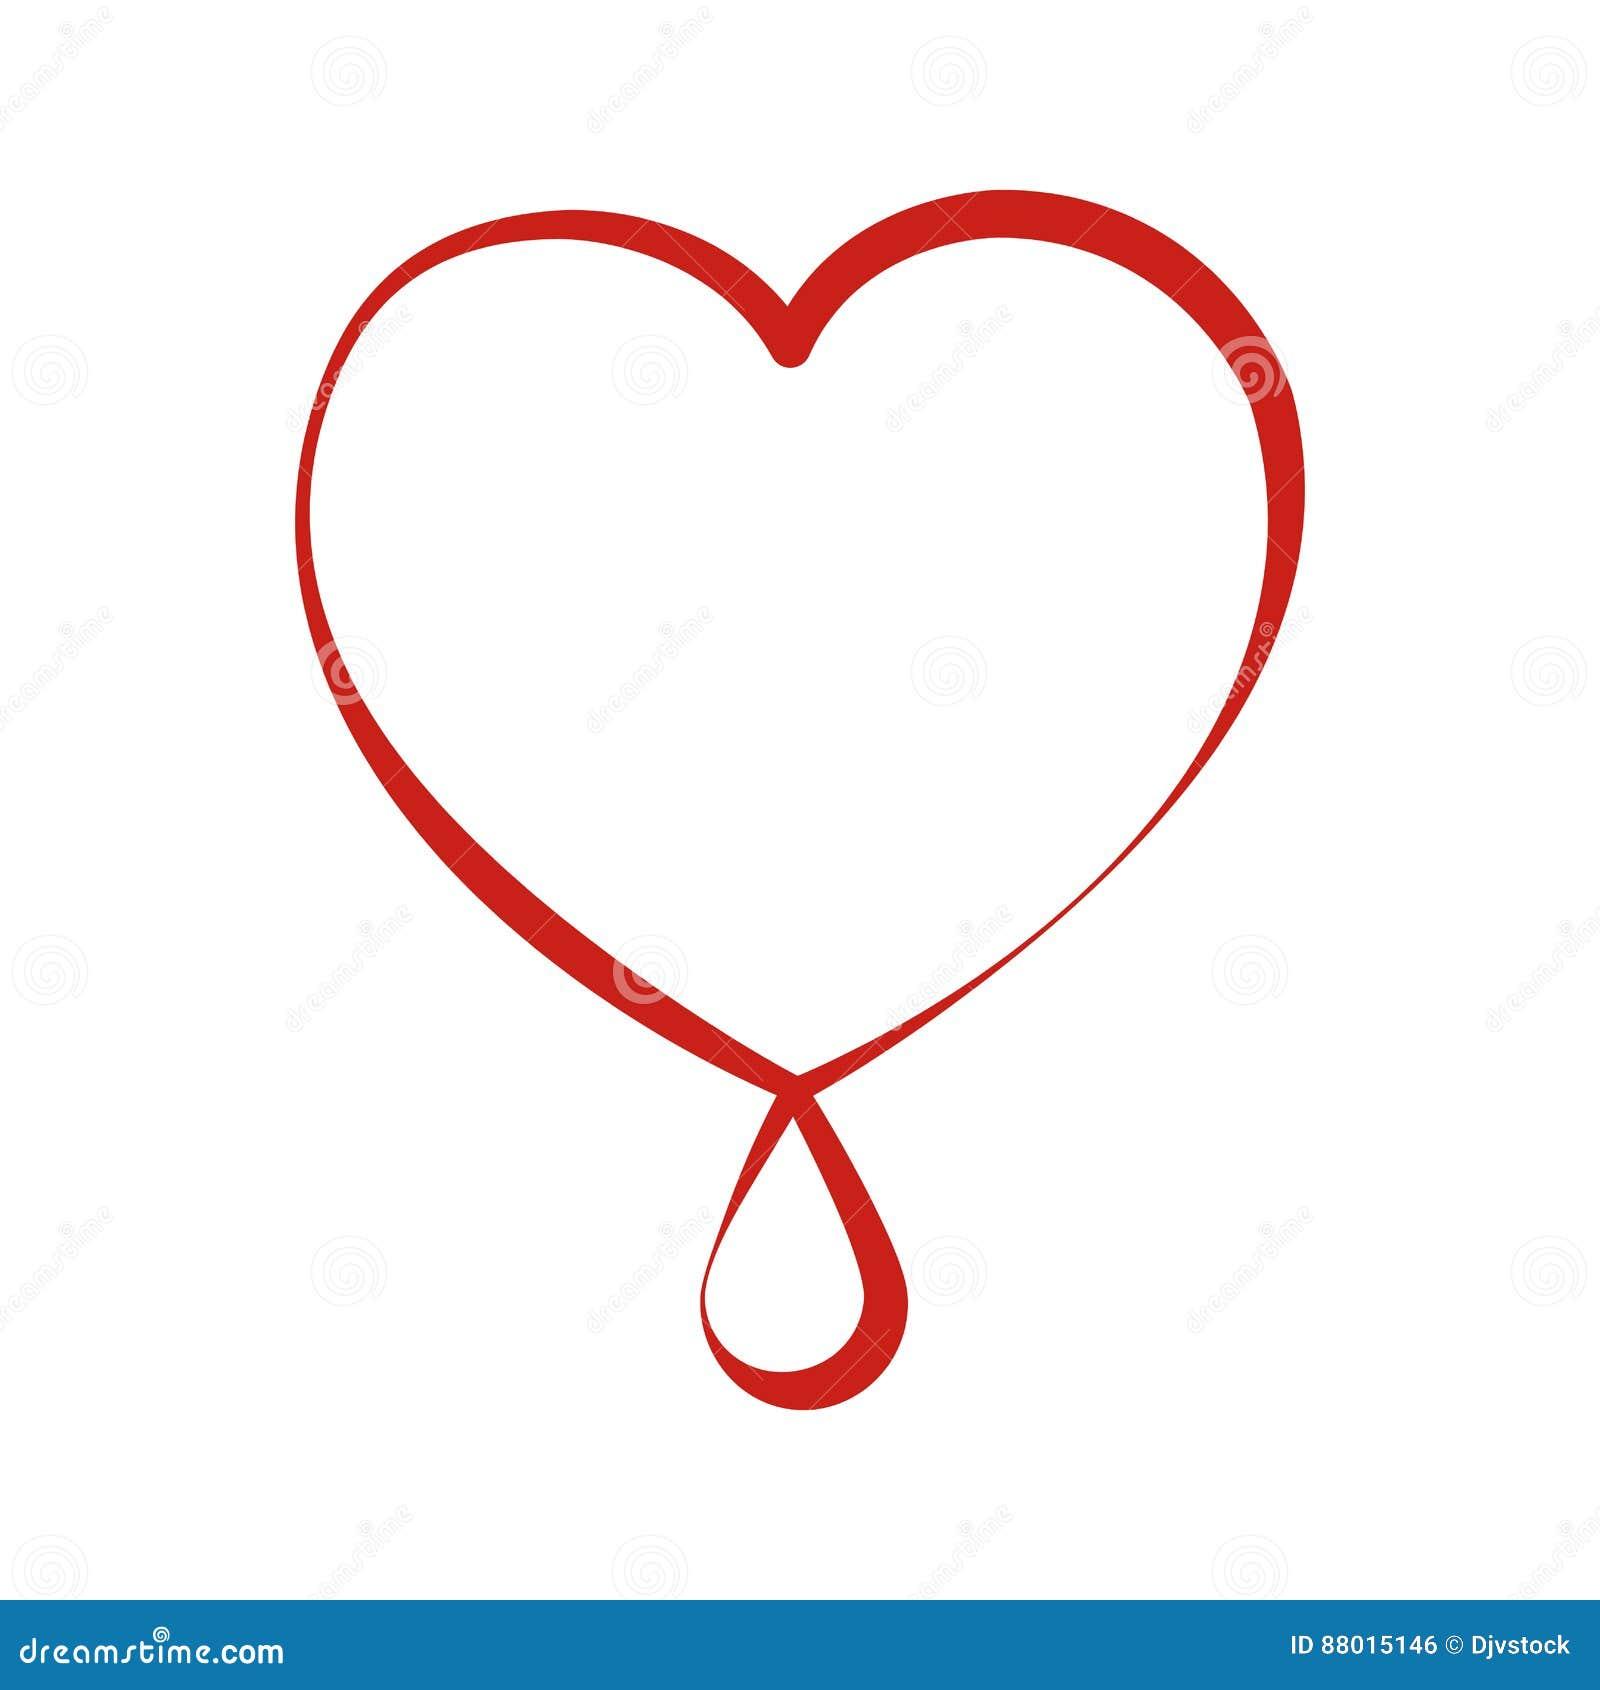 Blood donation symbol stock photo cartoondealer 52102164 buycottarizona